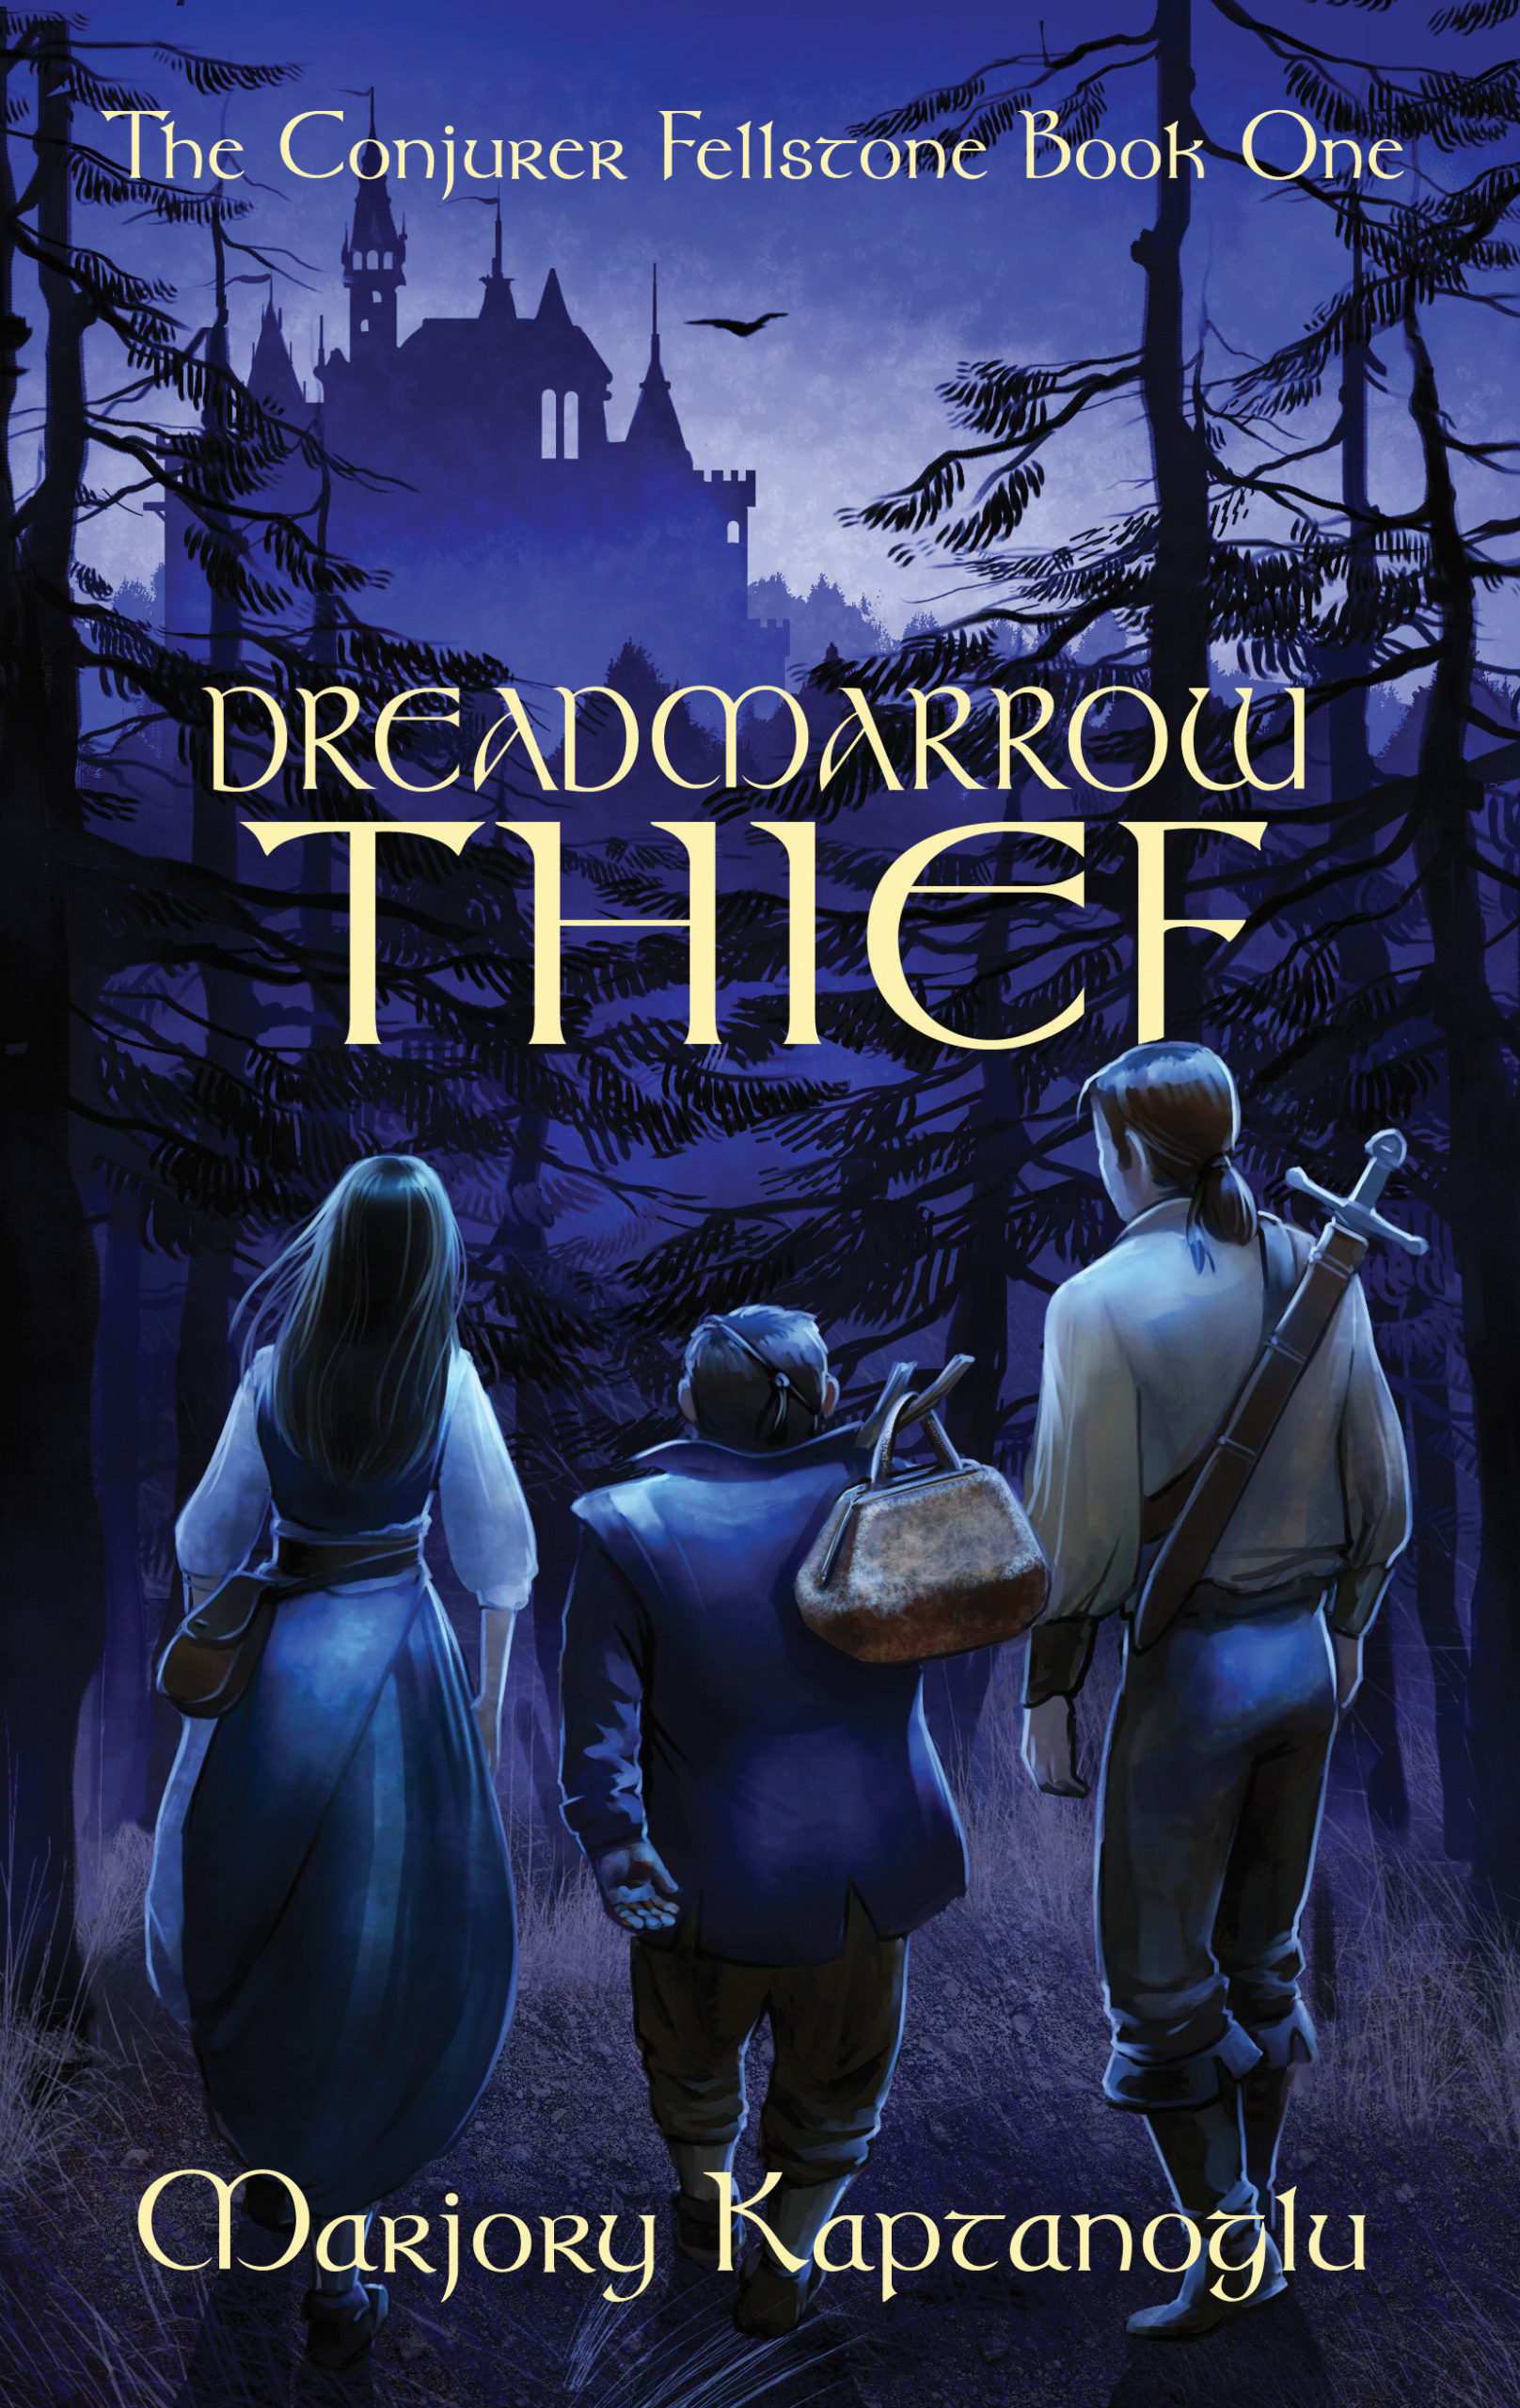 Dreadmarrow-Thief.cover